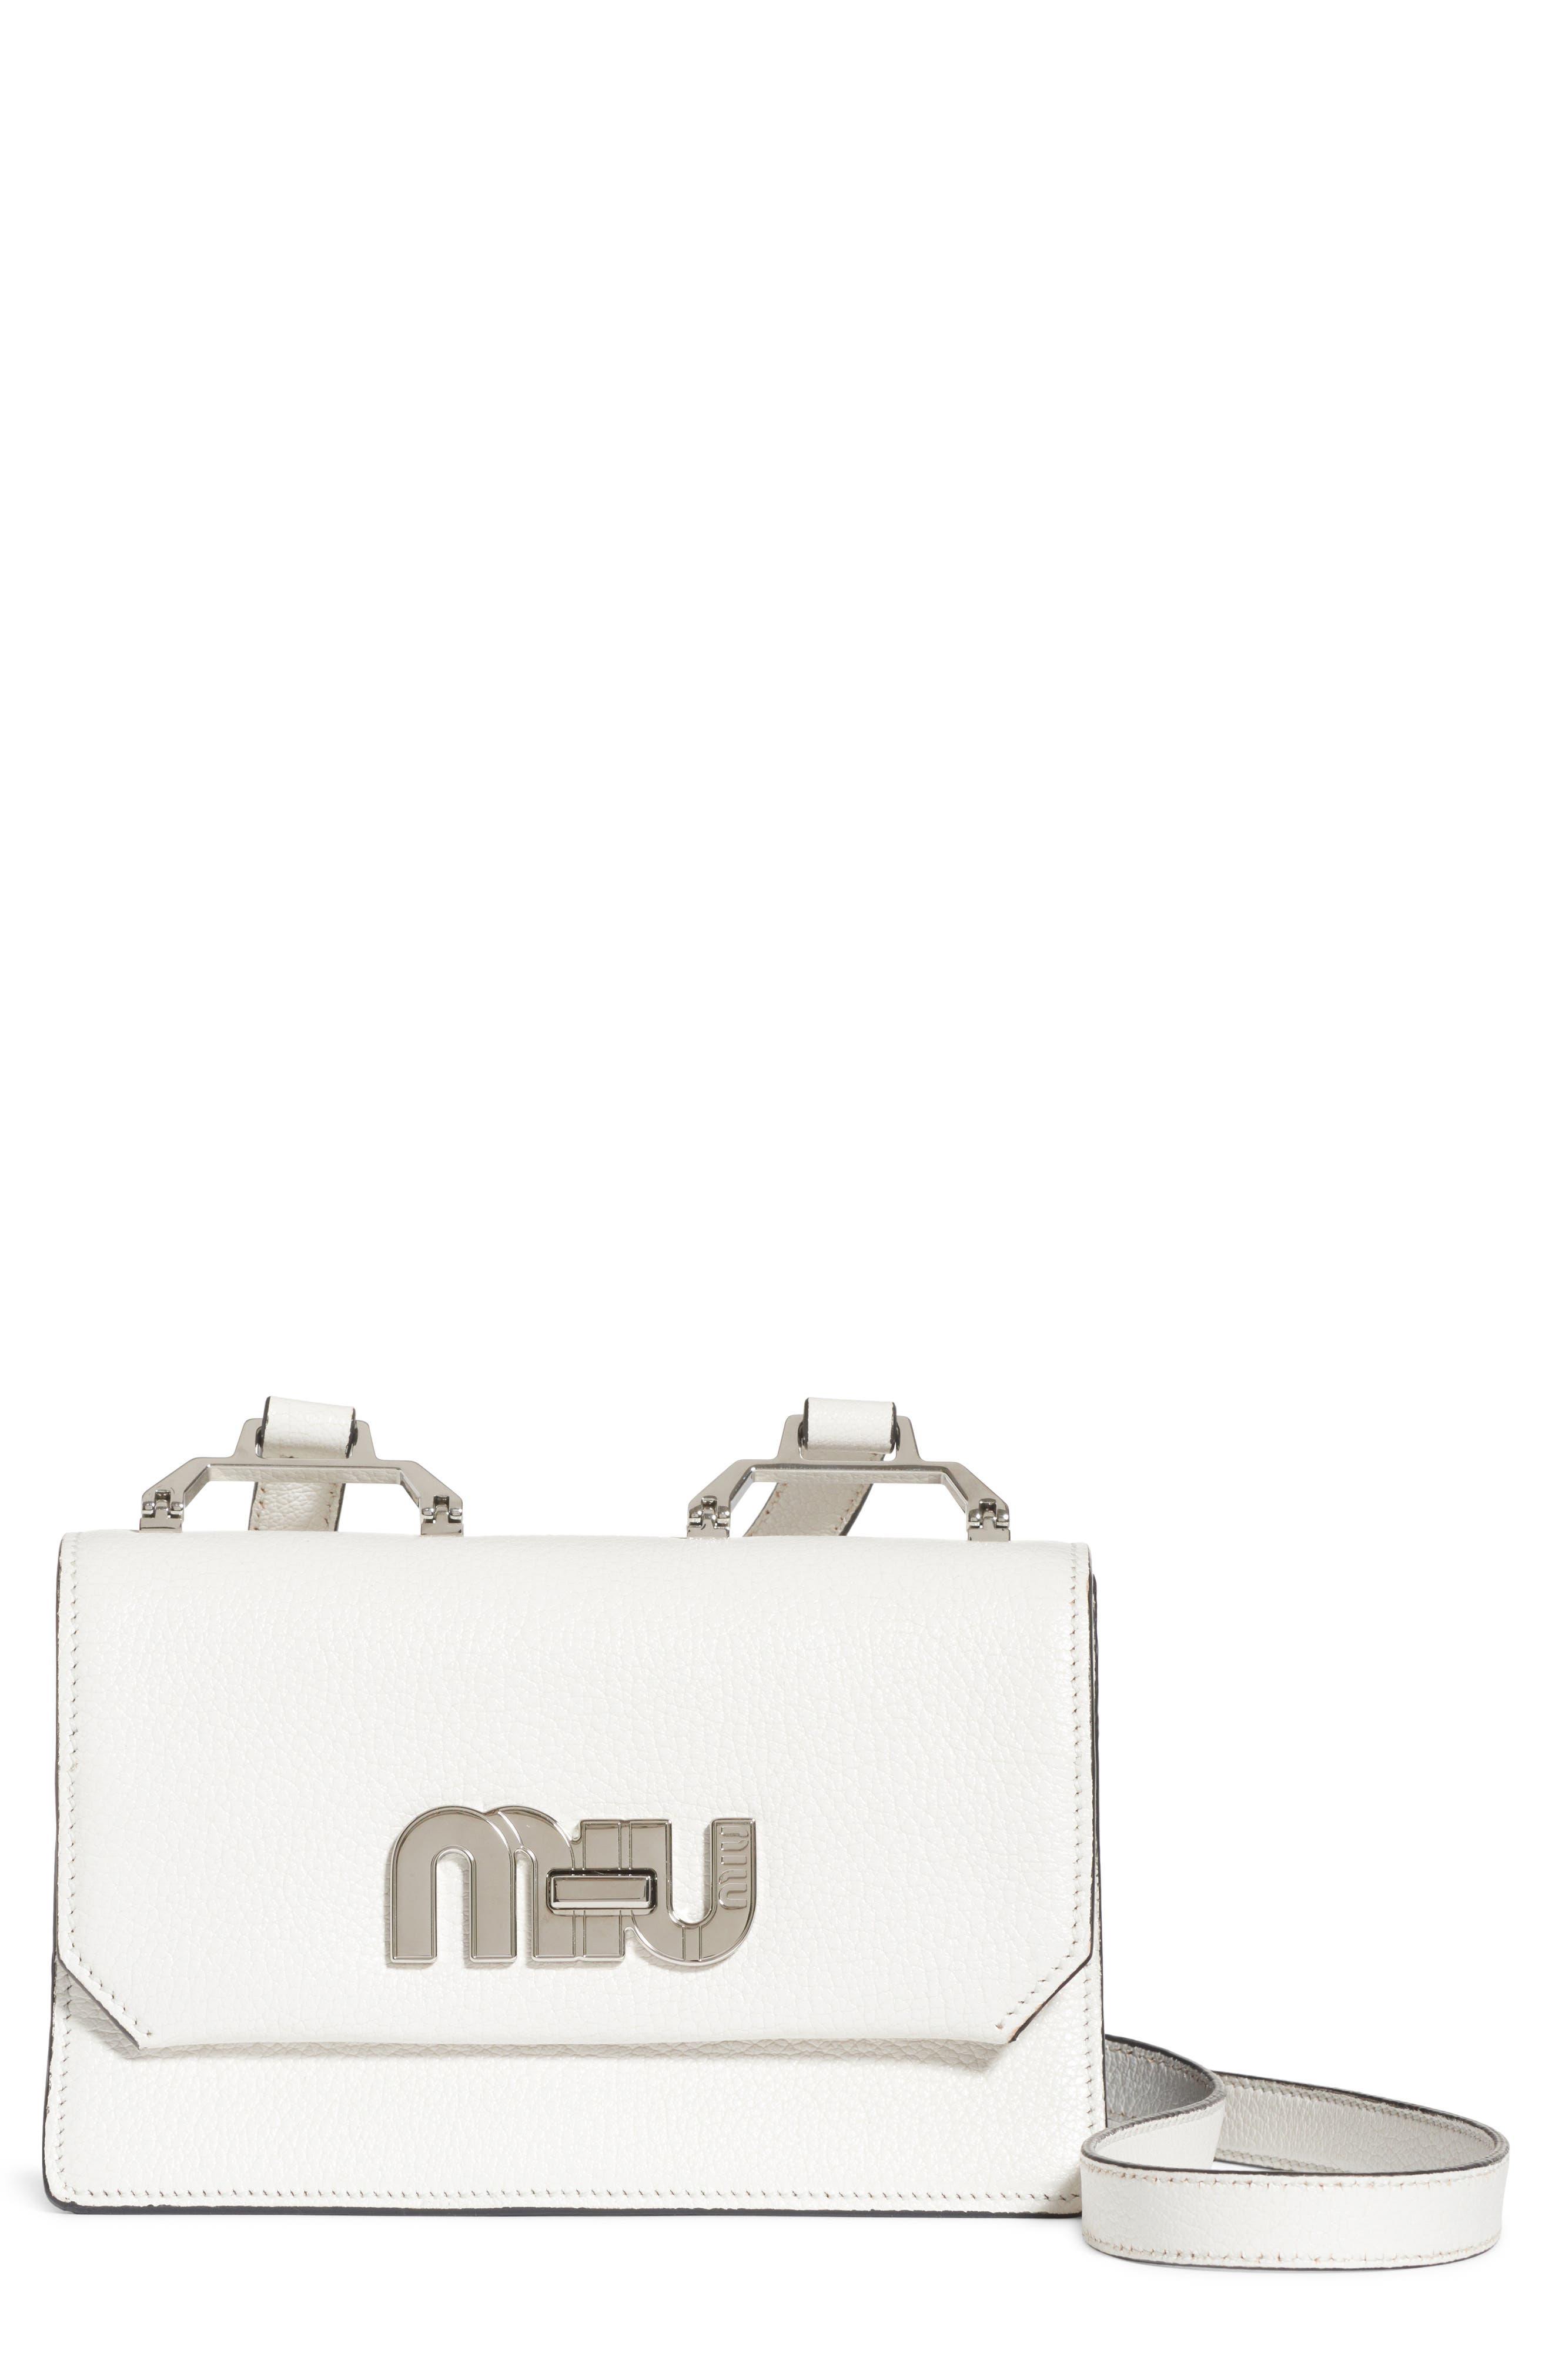 Leather Crossbody Bag,                             Main thumbnail 1, color,                             Bianco/ Baltico